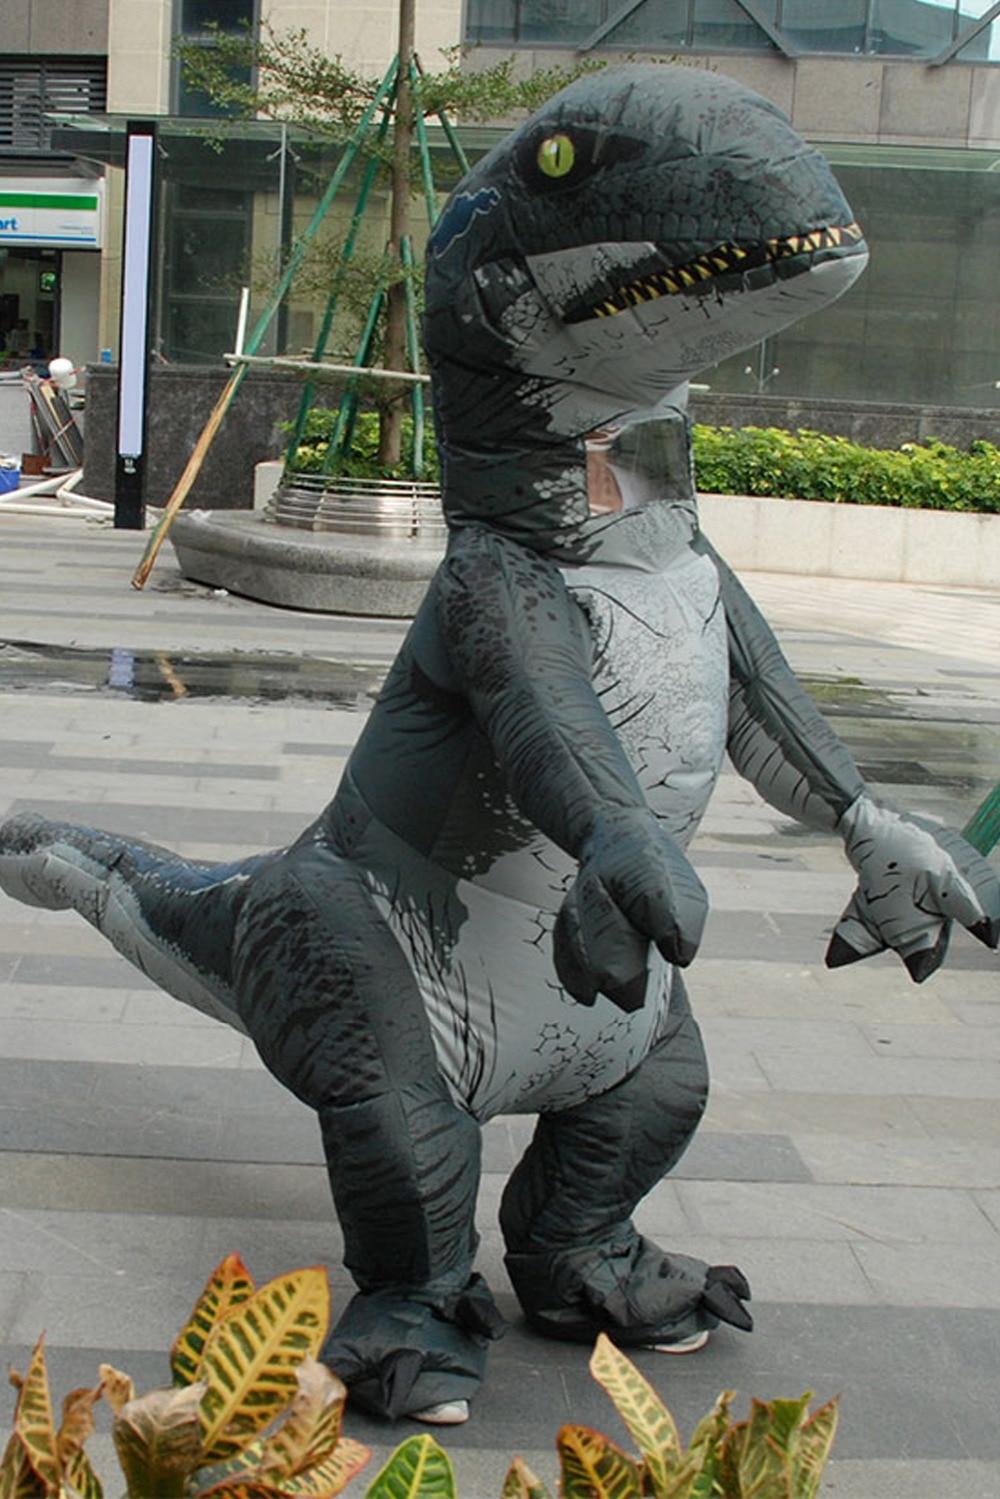 Inflatable Dinosaur Cosutme For Adult Jurrasic World Raptor Dinosaur Costume Halloween Cosplay Costumes